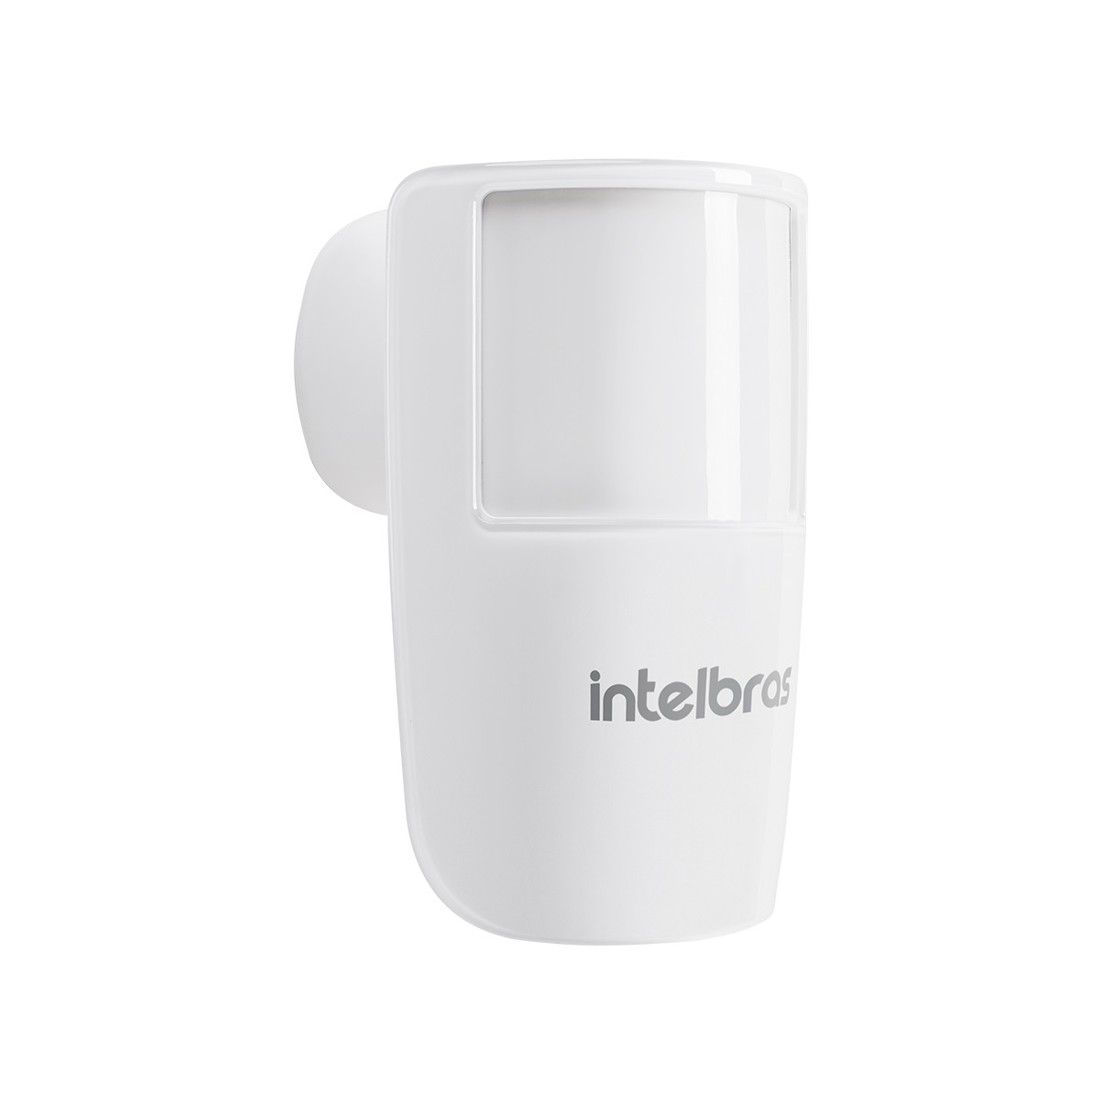 Sensor de Presença Intelbras iS5 Sem Fio